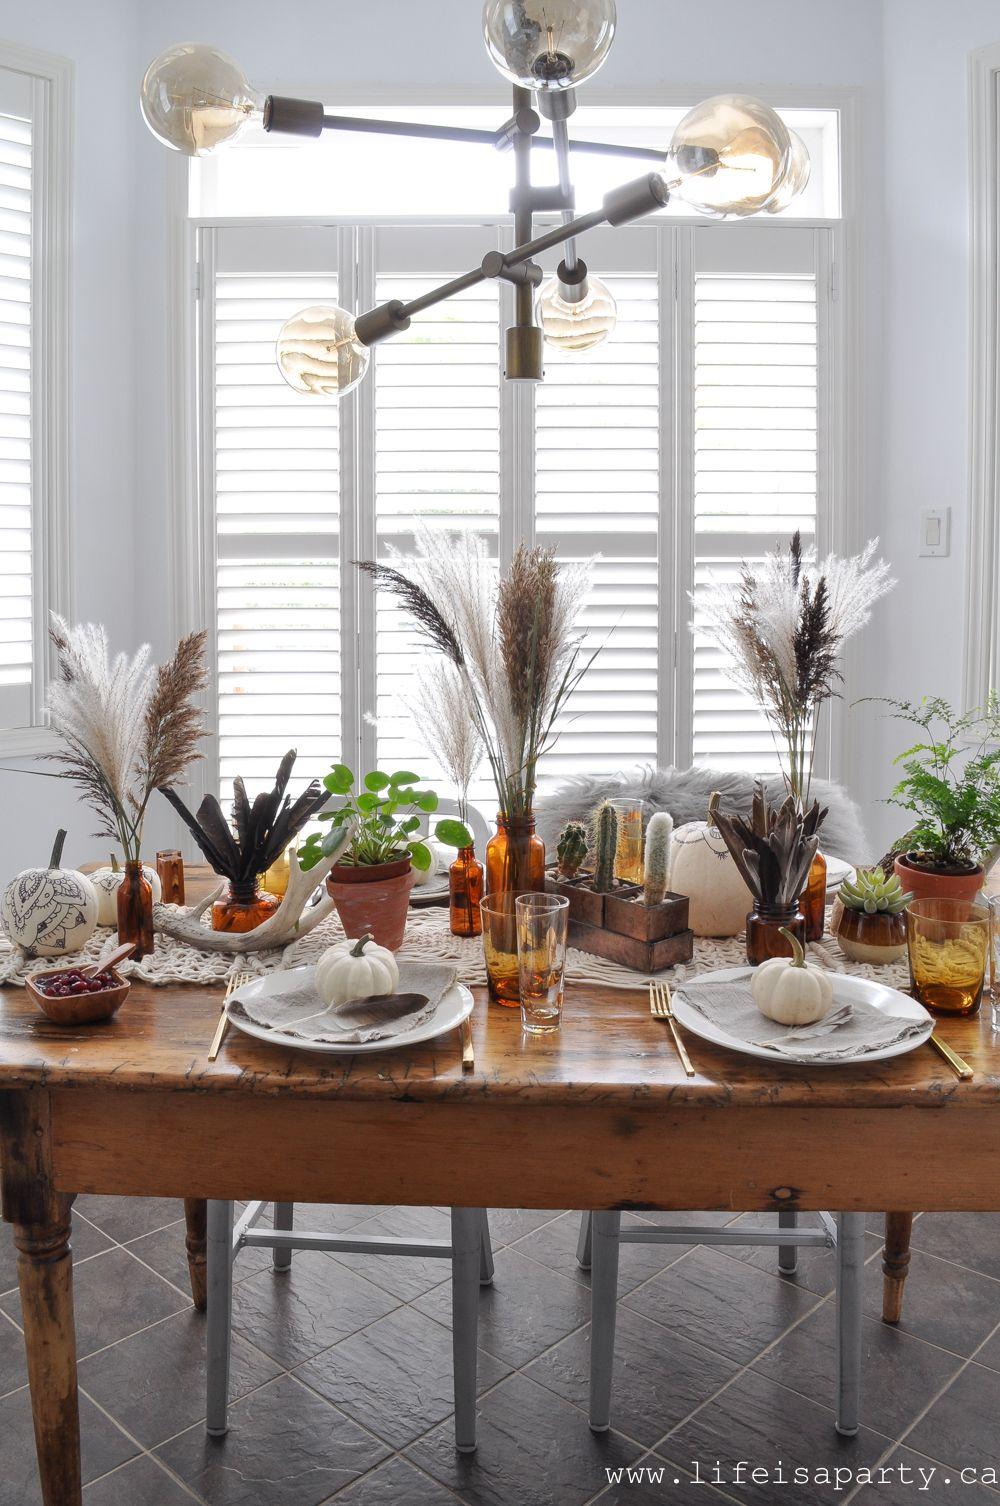 elements of boho style for a boho thanksgiving table decor fall living room decor boho style on boho chic kitchen table decor id=49984